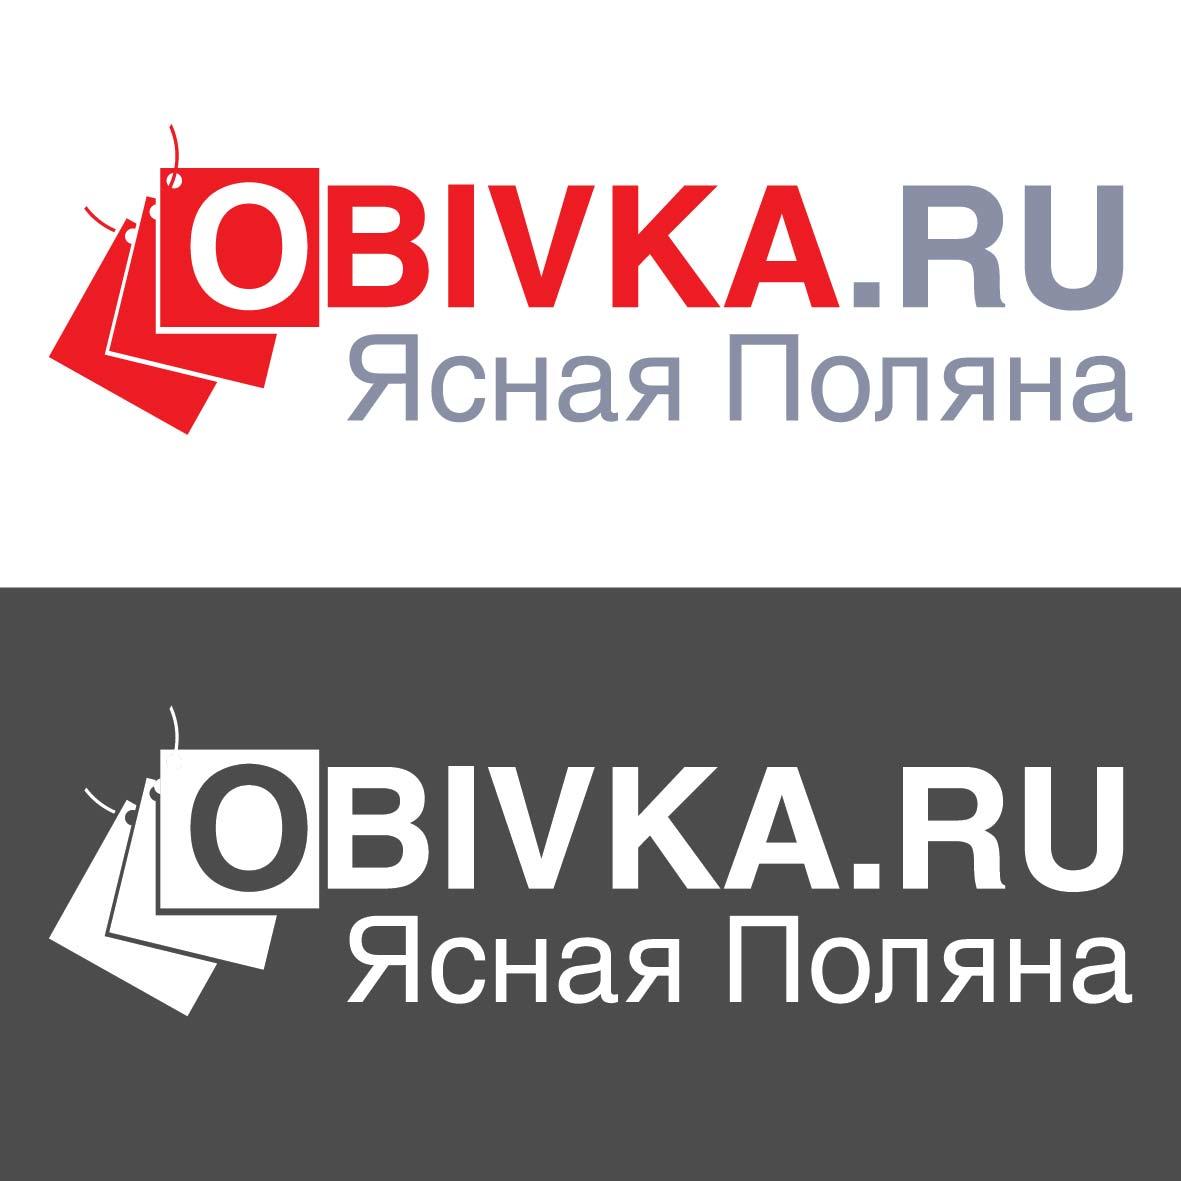 Логотип для сайта OBIVKA.RU фото f_8375c10fdd640948.jpg